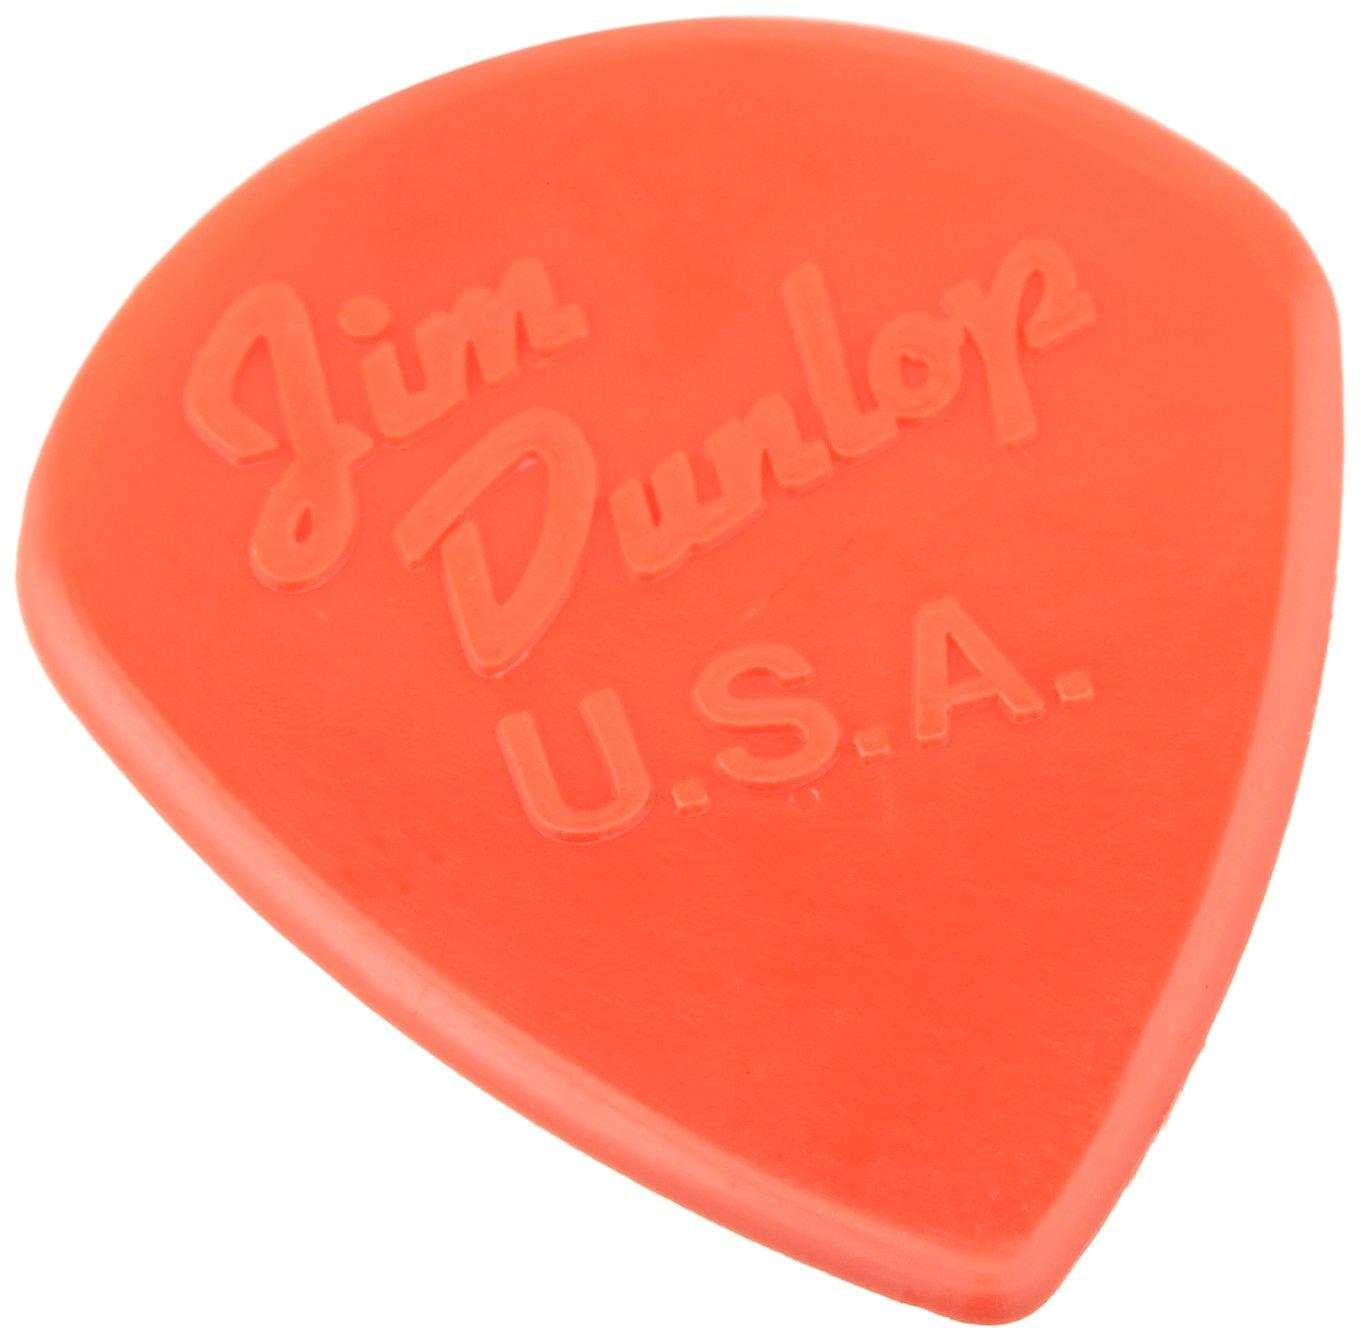 Dunlop 47R3N Jazz III 1.38mm Sharp Tip Nylon Guitar Picks, 24-Pack